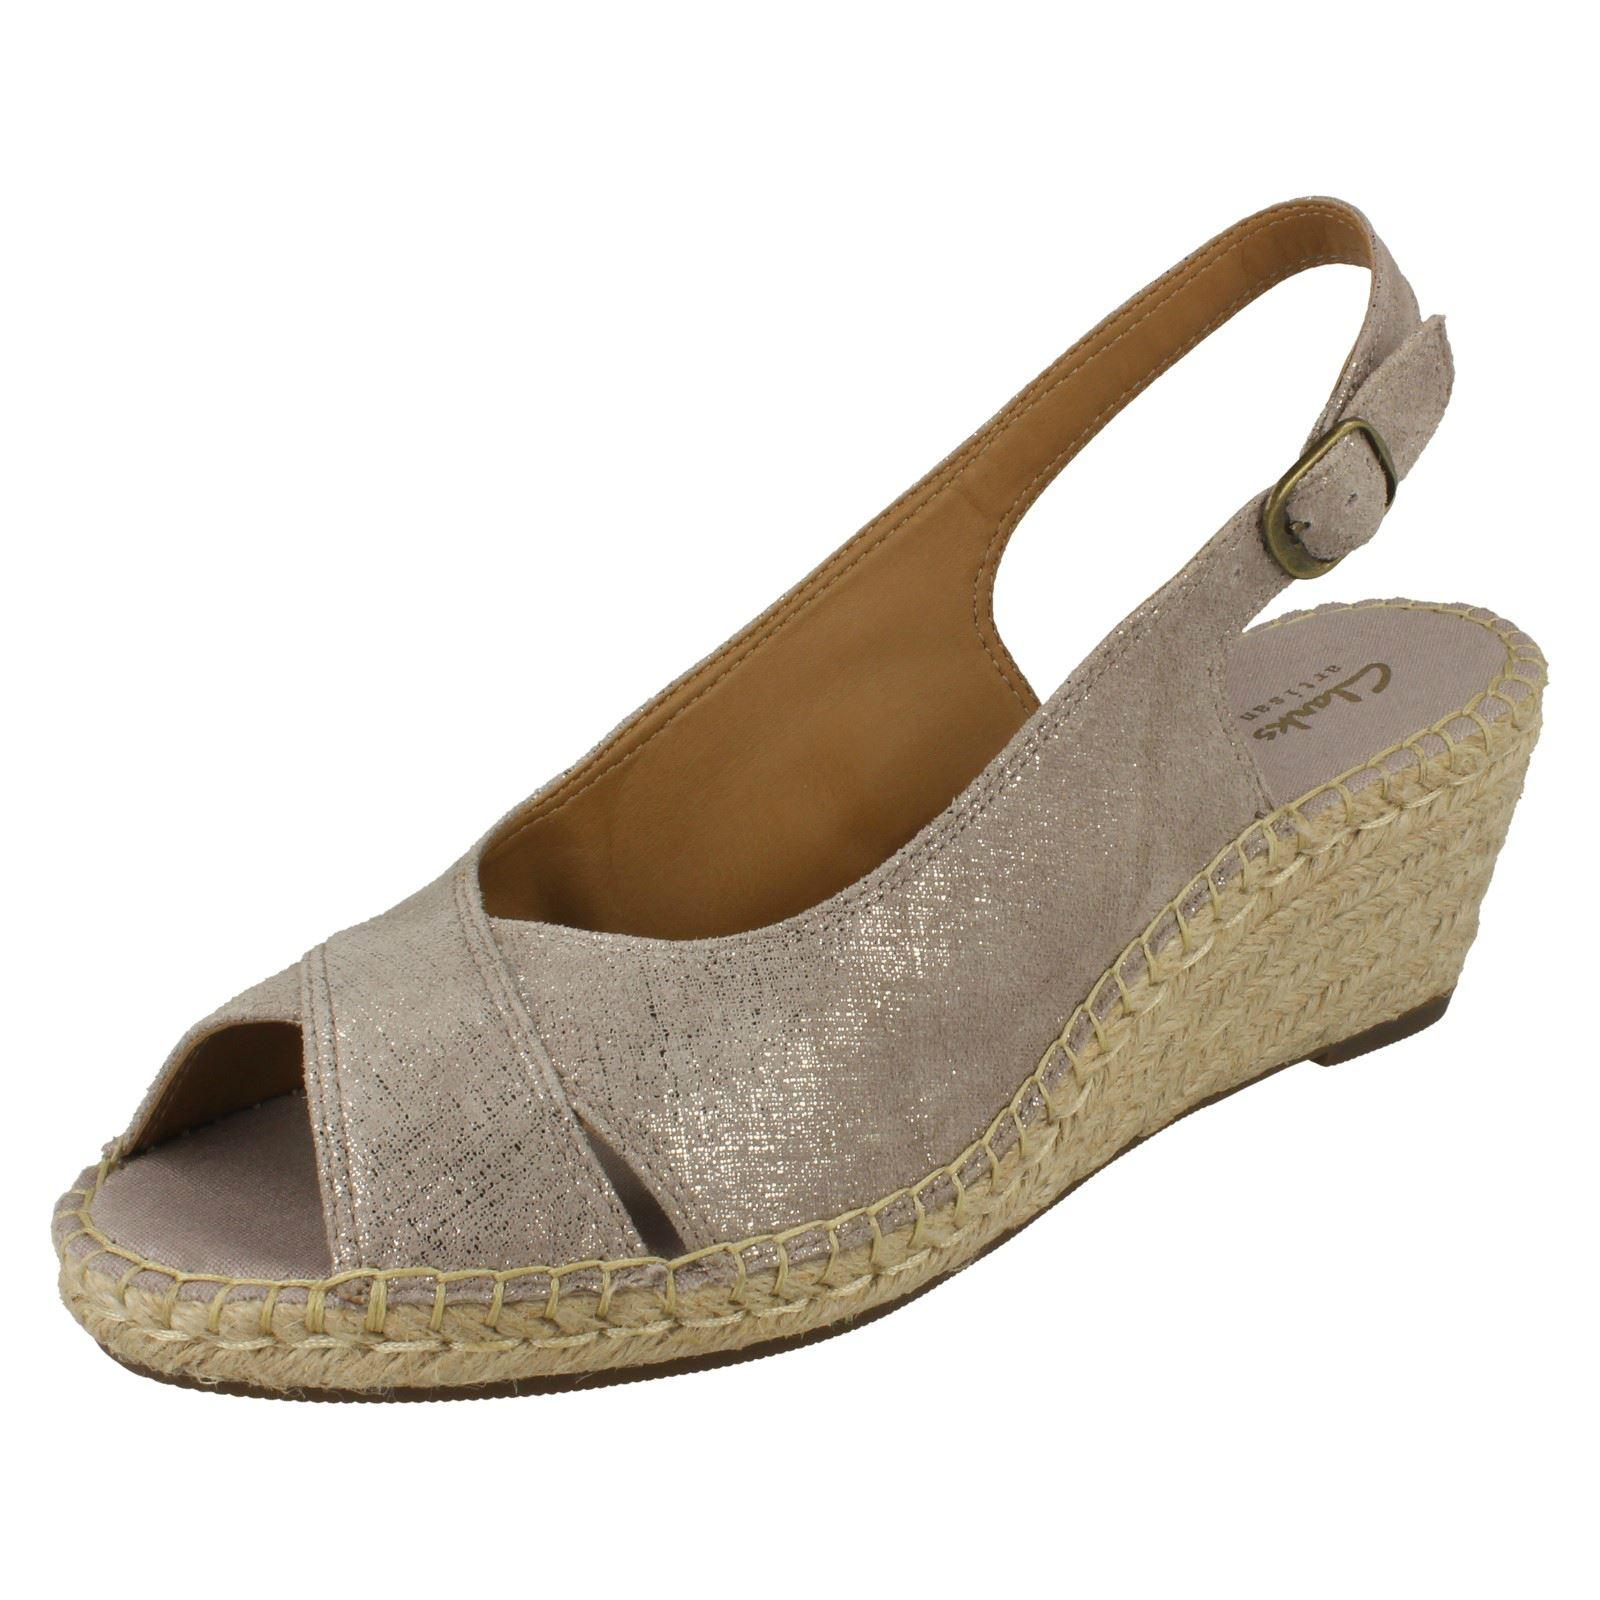 8af62d3b146 Clarks Ladies Sling Back Wedge Sandals Petrina Leigh